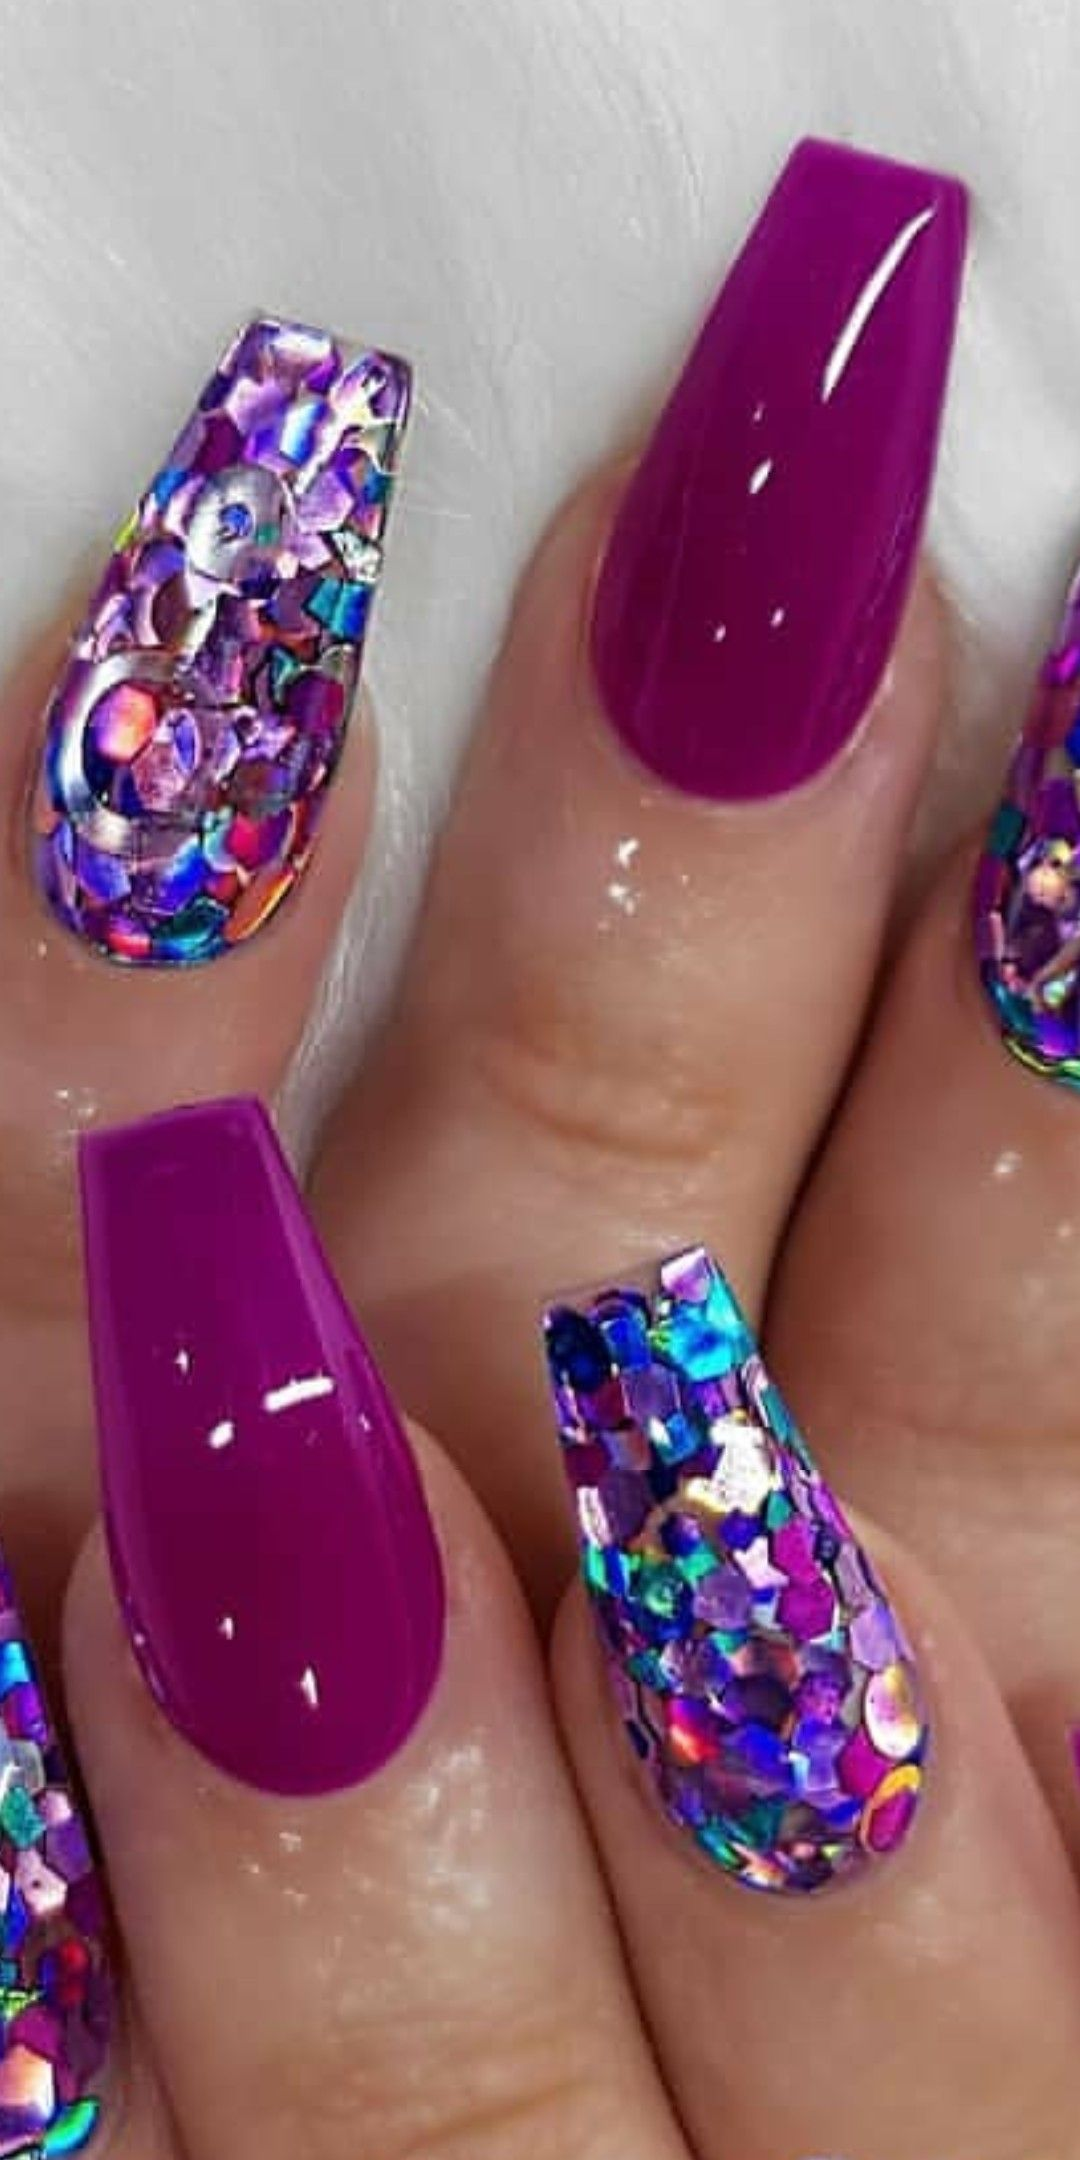 Magenta And Blue Sheet Glitter Nail Art Very Pretty Follow Kathy Now Magenta Nails Blue Glitter Nails Pink Glitter Nails